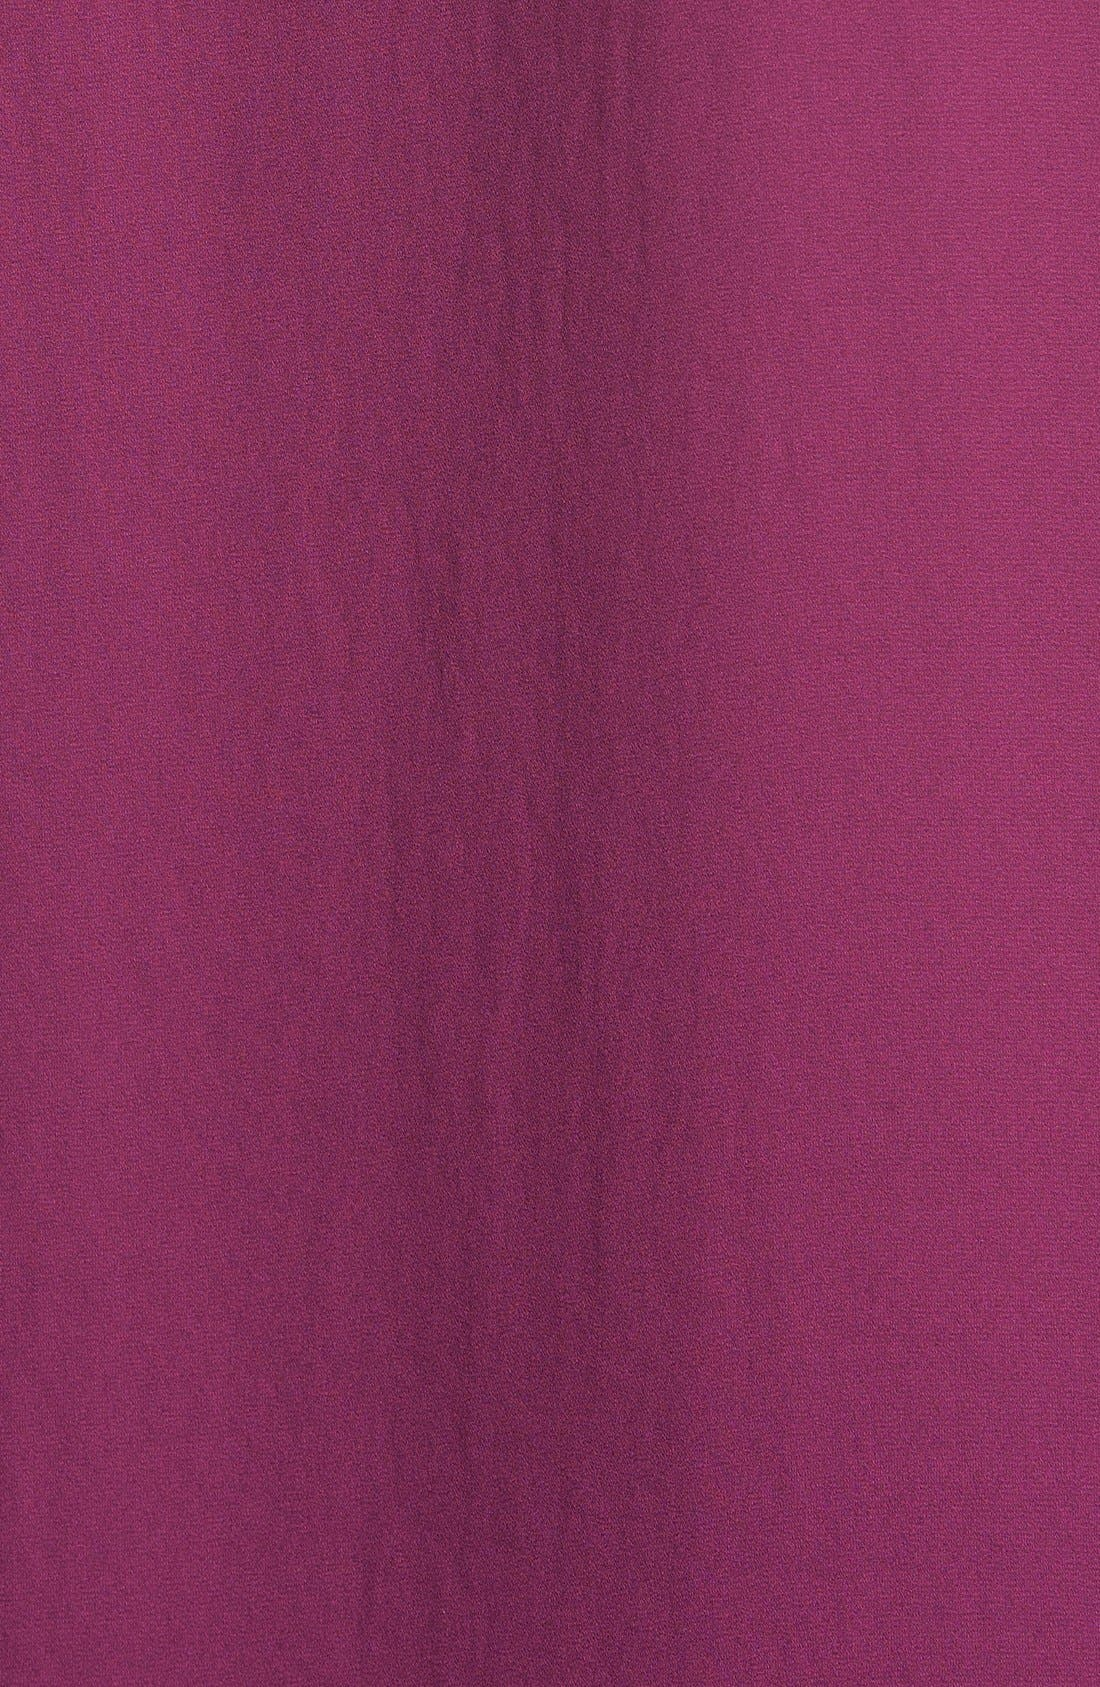 ,                             High/Low V-Neck Blouse,                             Alternate thumbnail 130, color,                             504